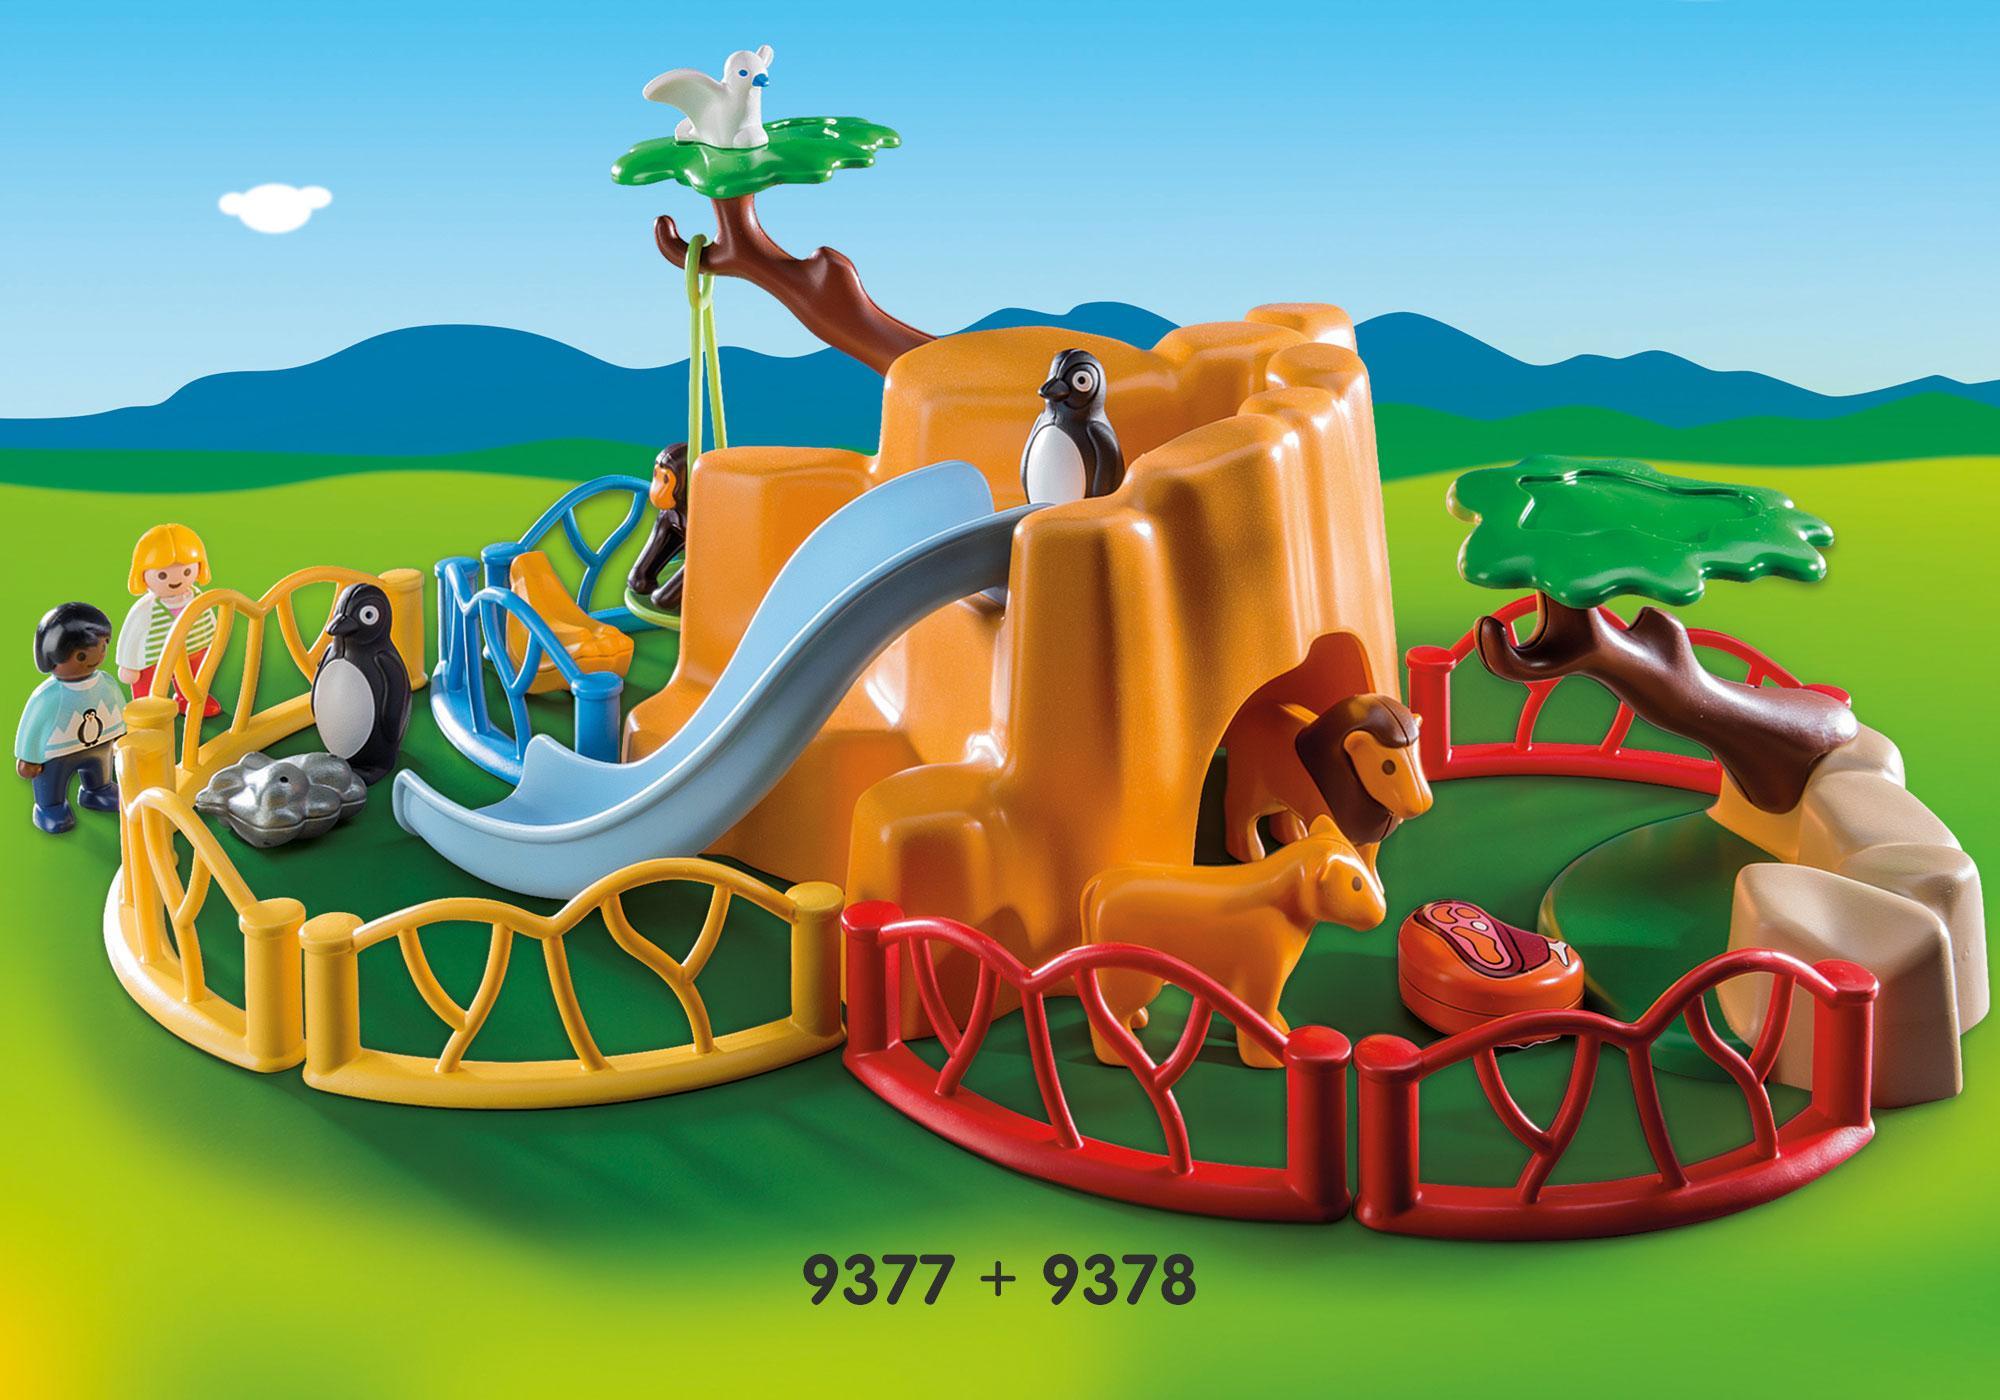 http://media.playmobil.com/i/playmobil/9377_product_extra1/Zoo